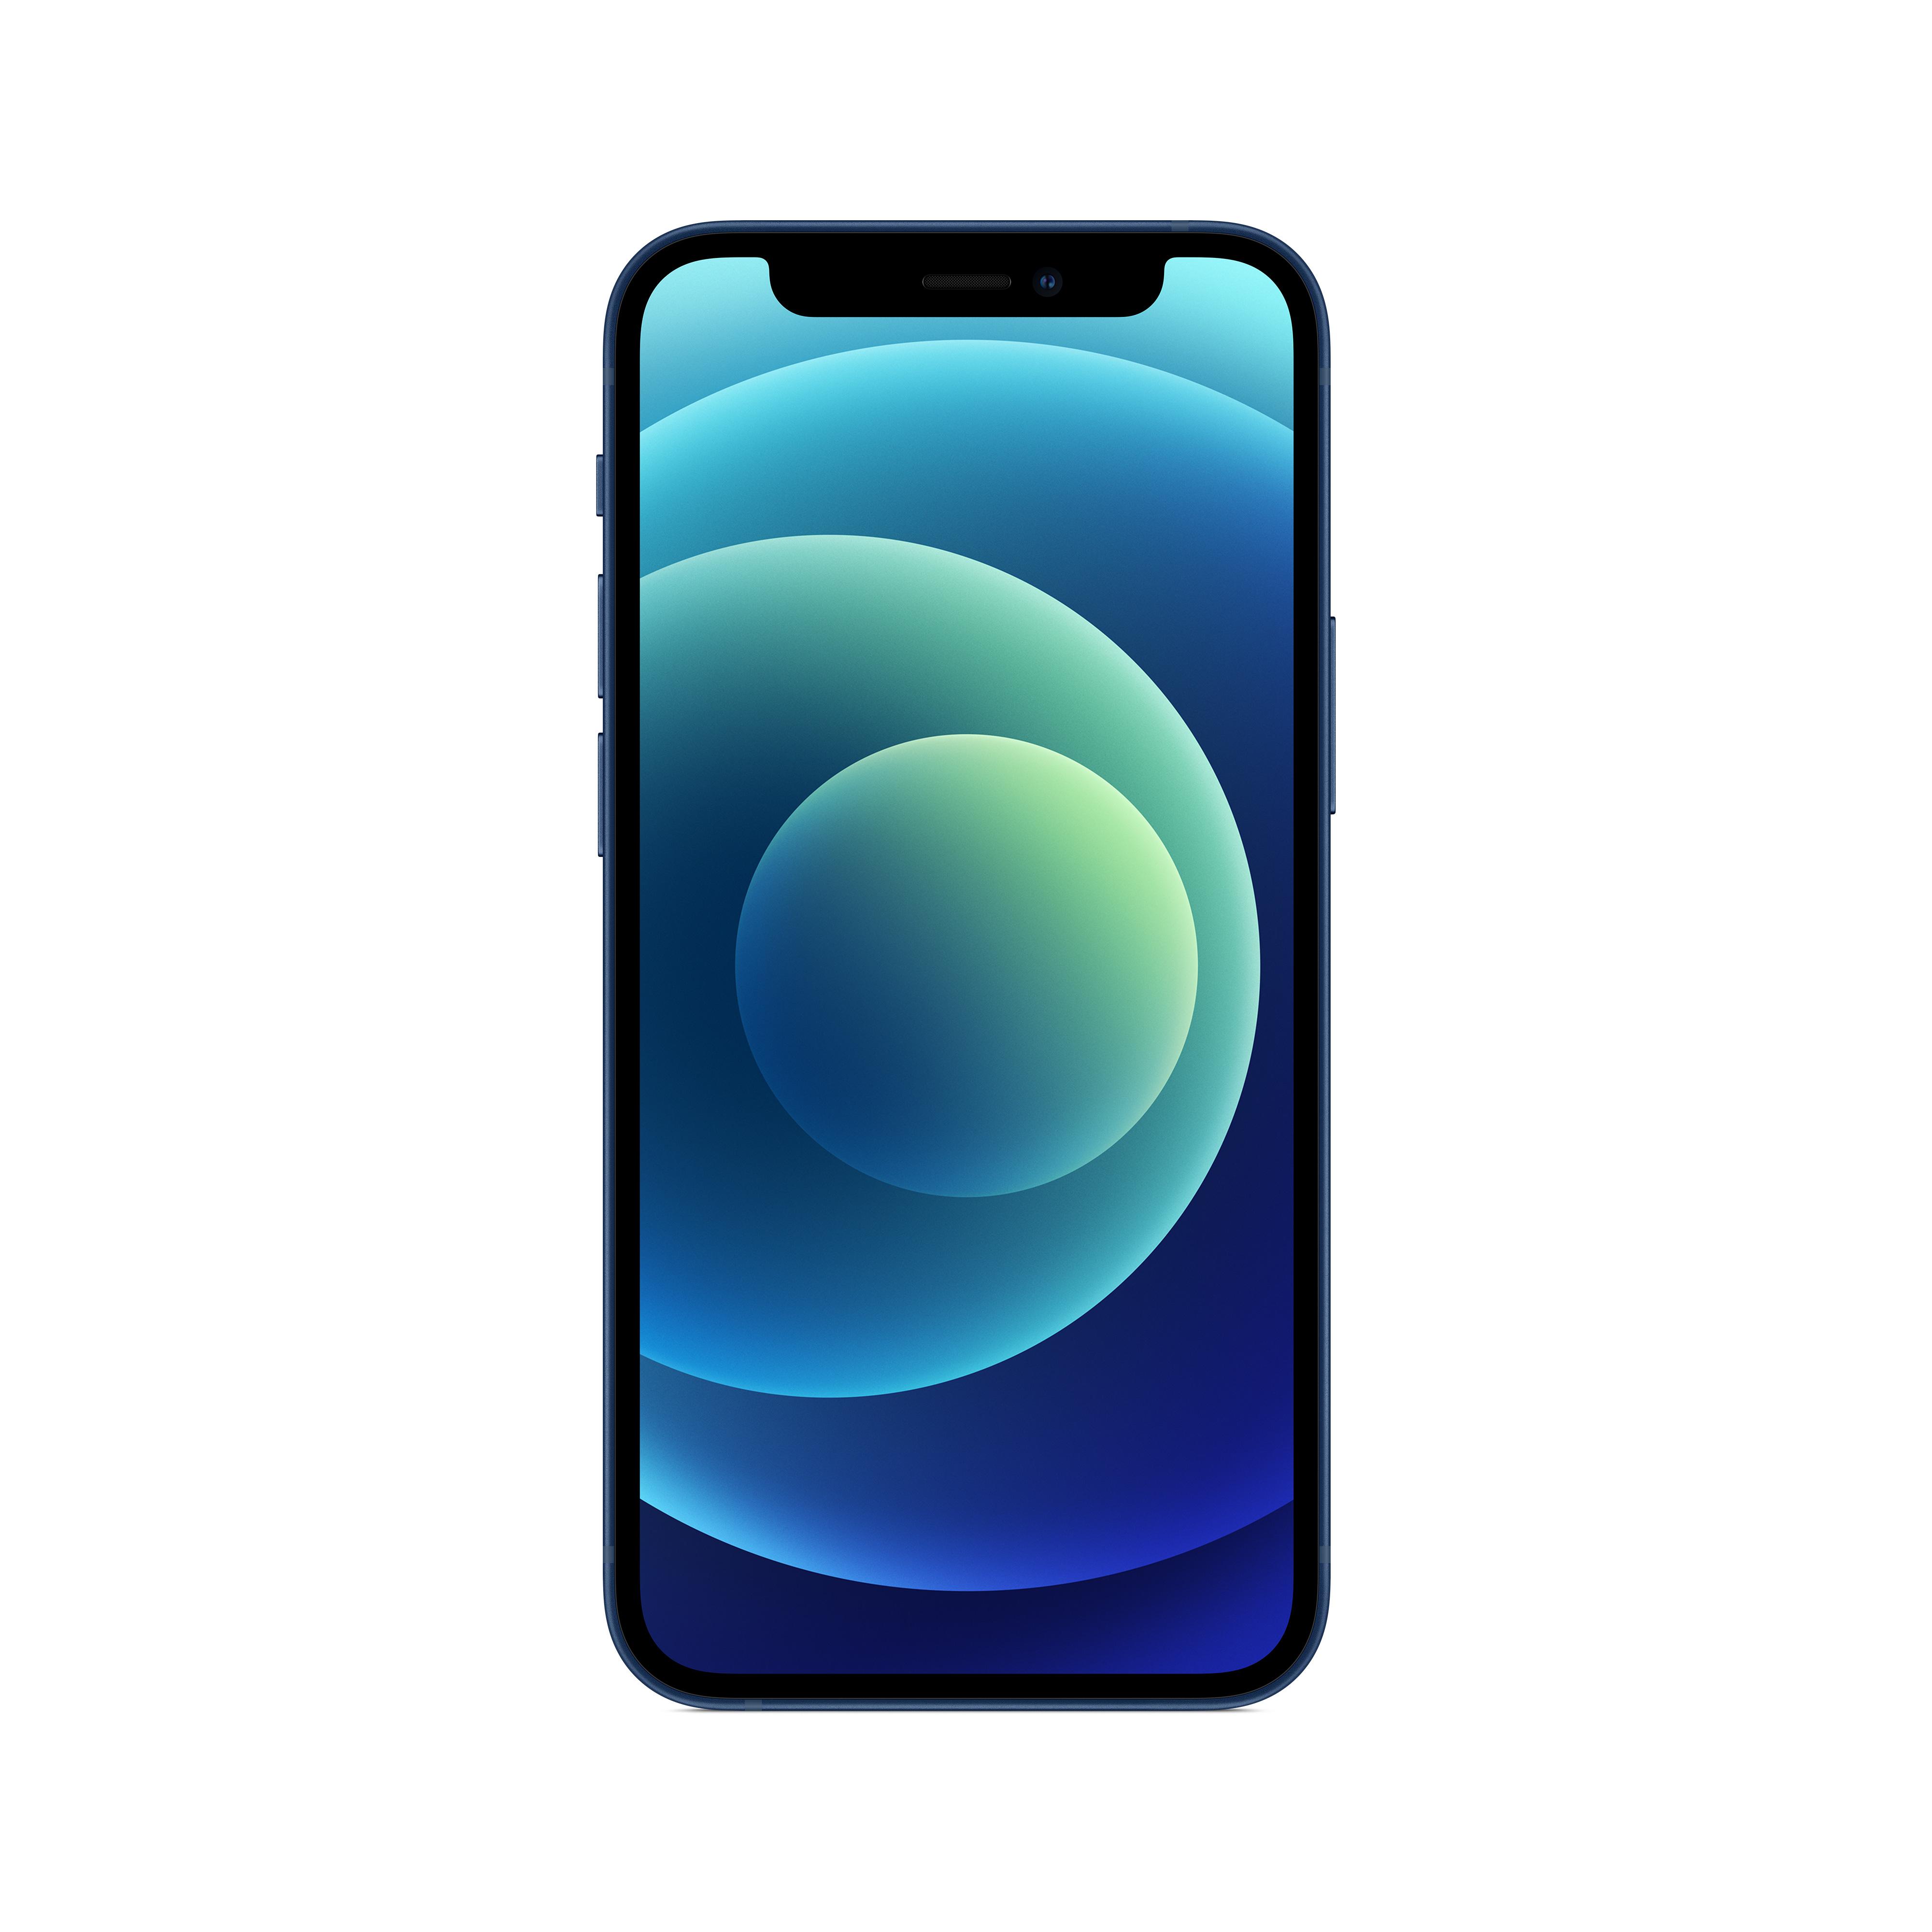 Apple Iphone 12 128gb Blue Super Retina XDR